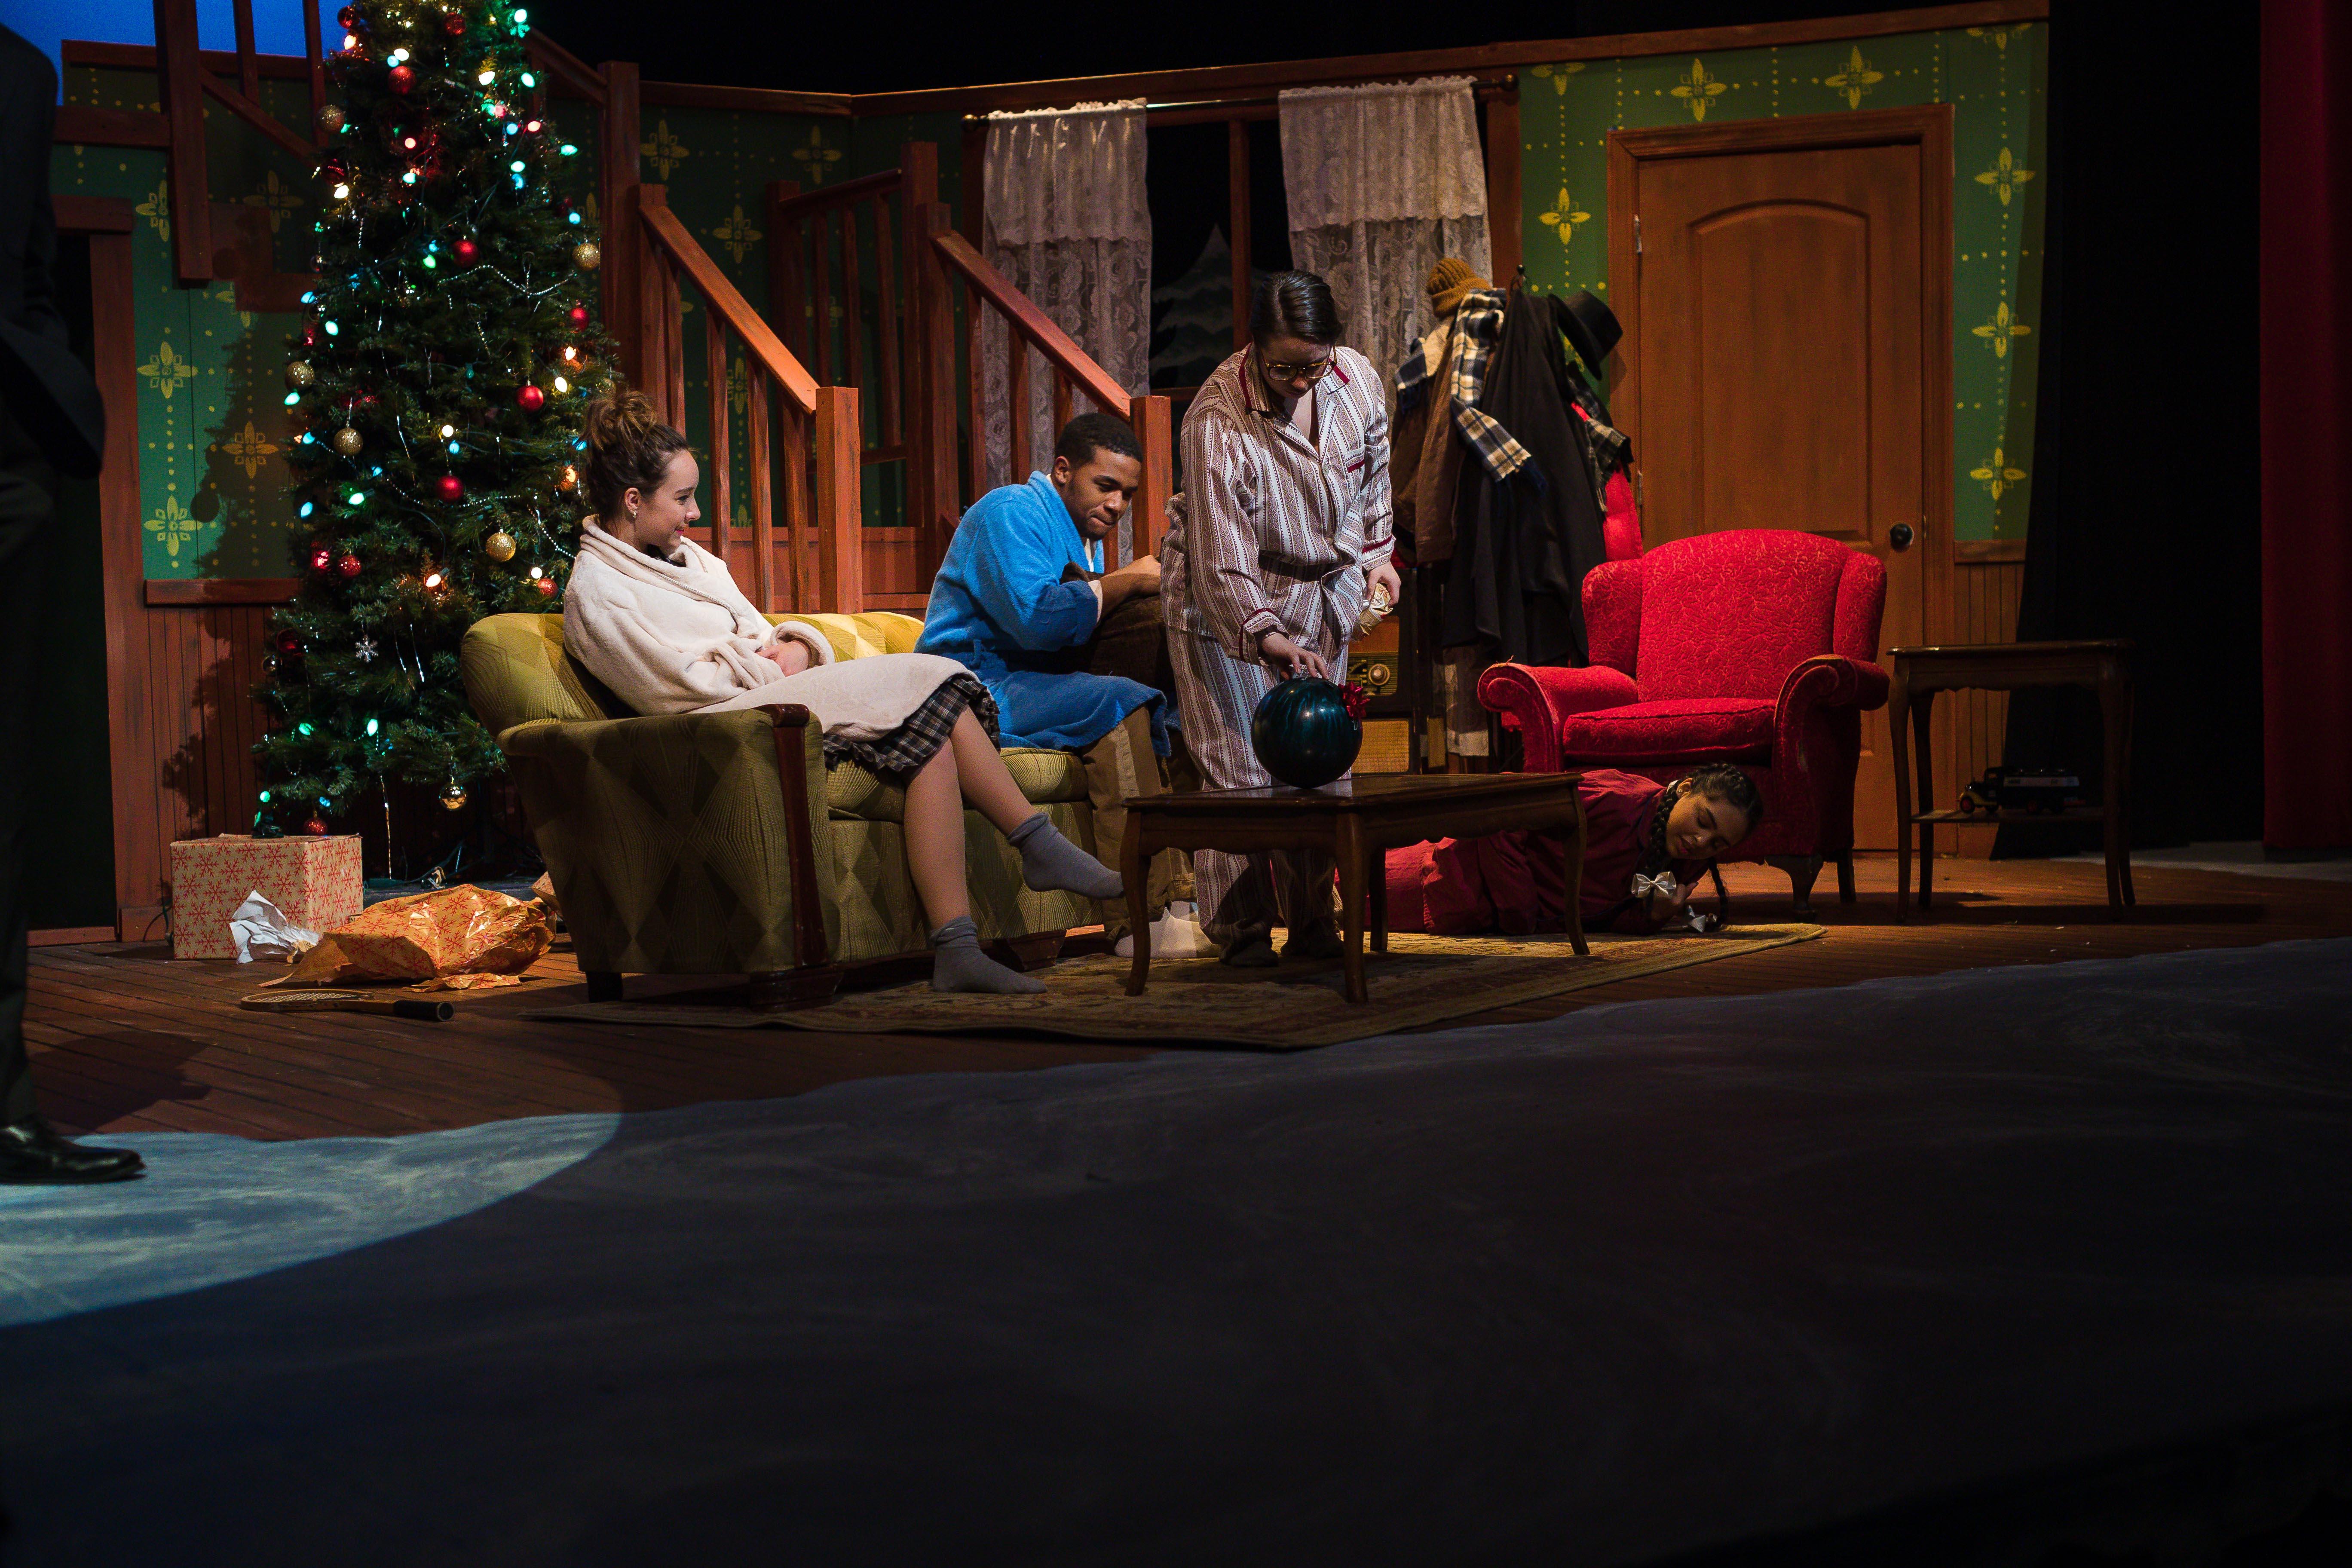 Weaver_Christmasshoot-_MG_1513